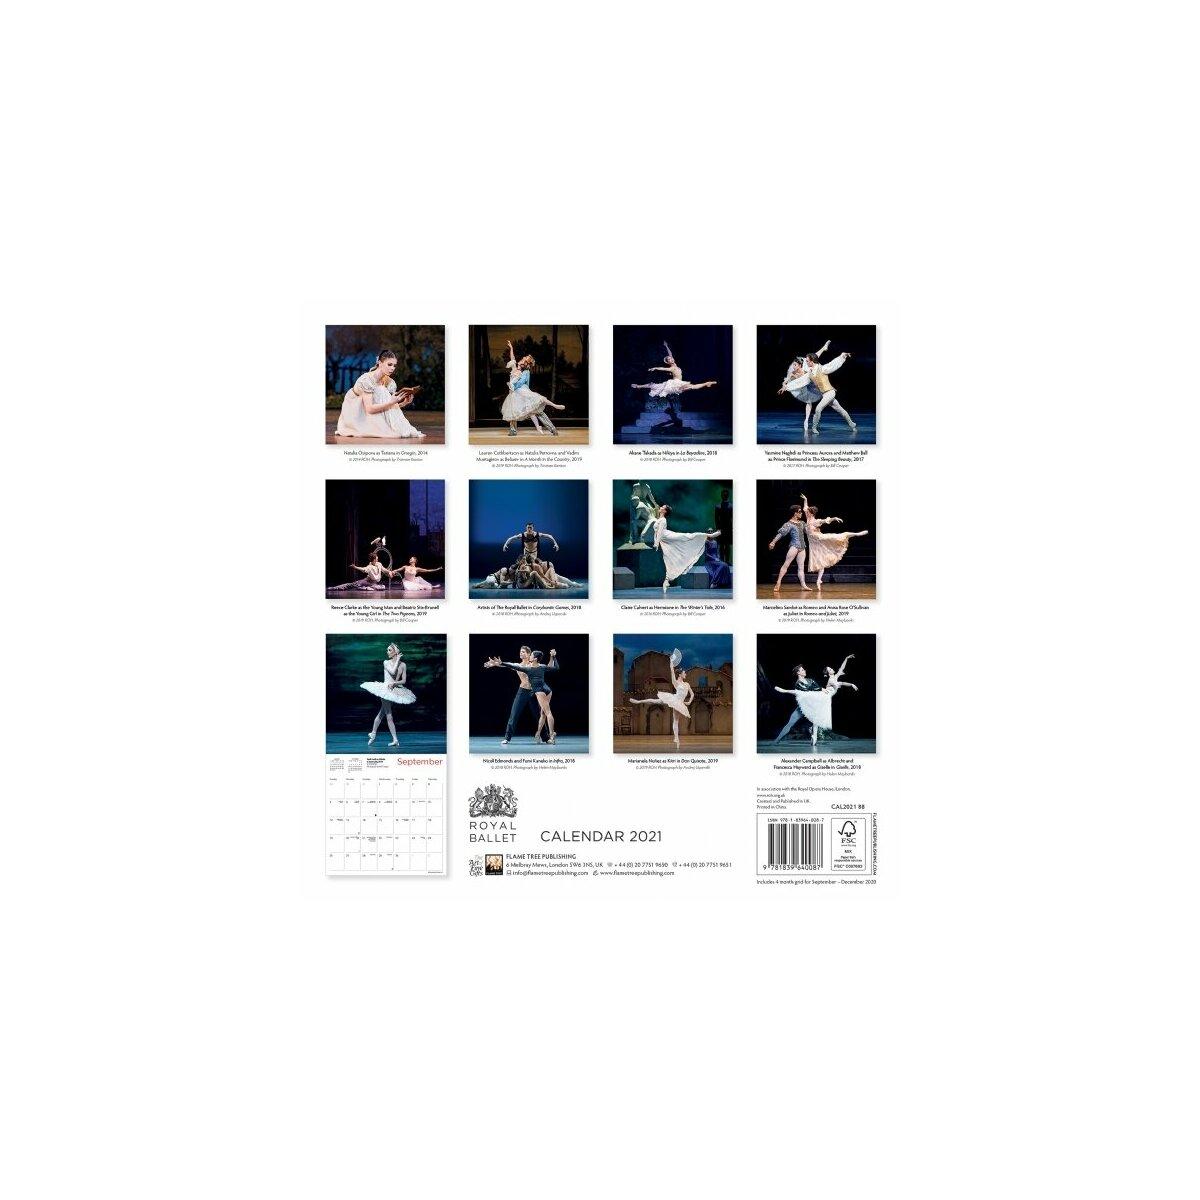 Calendrier 2021 Ballet de Danse   royal